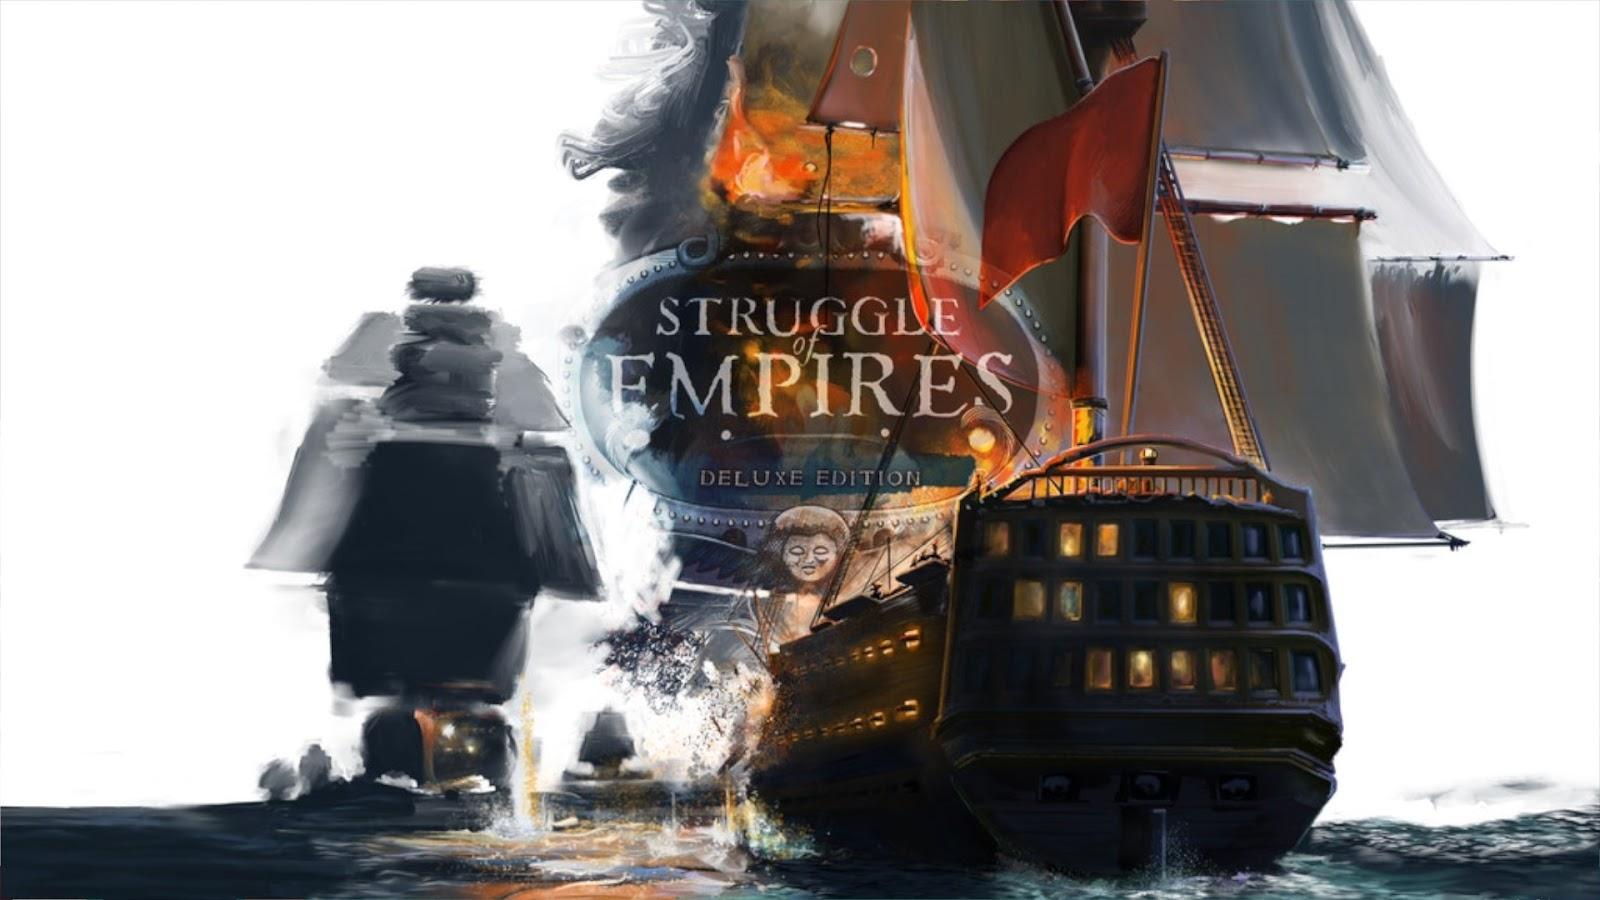 Kickstarter Highlights - Struggle of Empires Deluxe